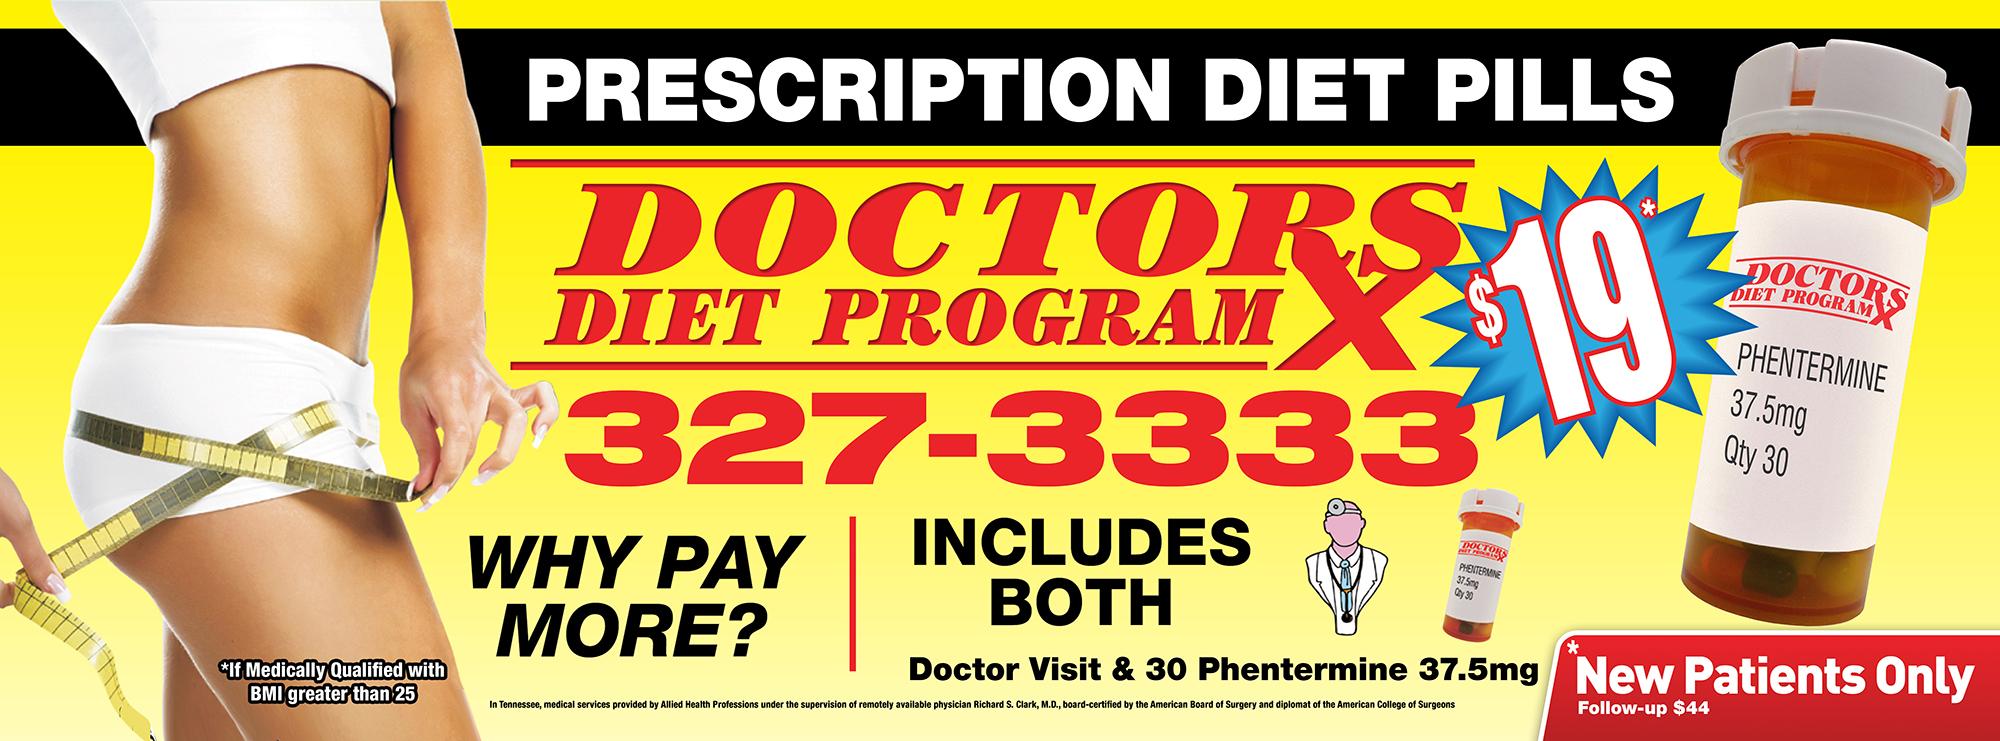 Welcome to the Doctors Diet Program